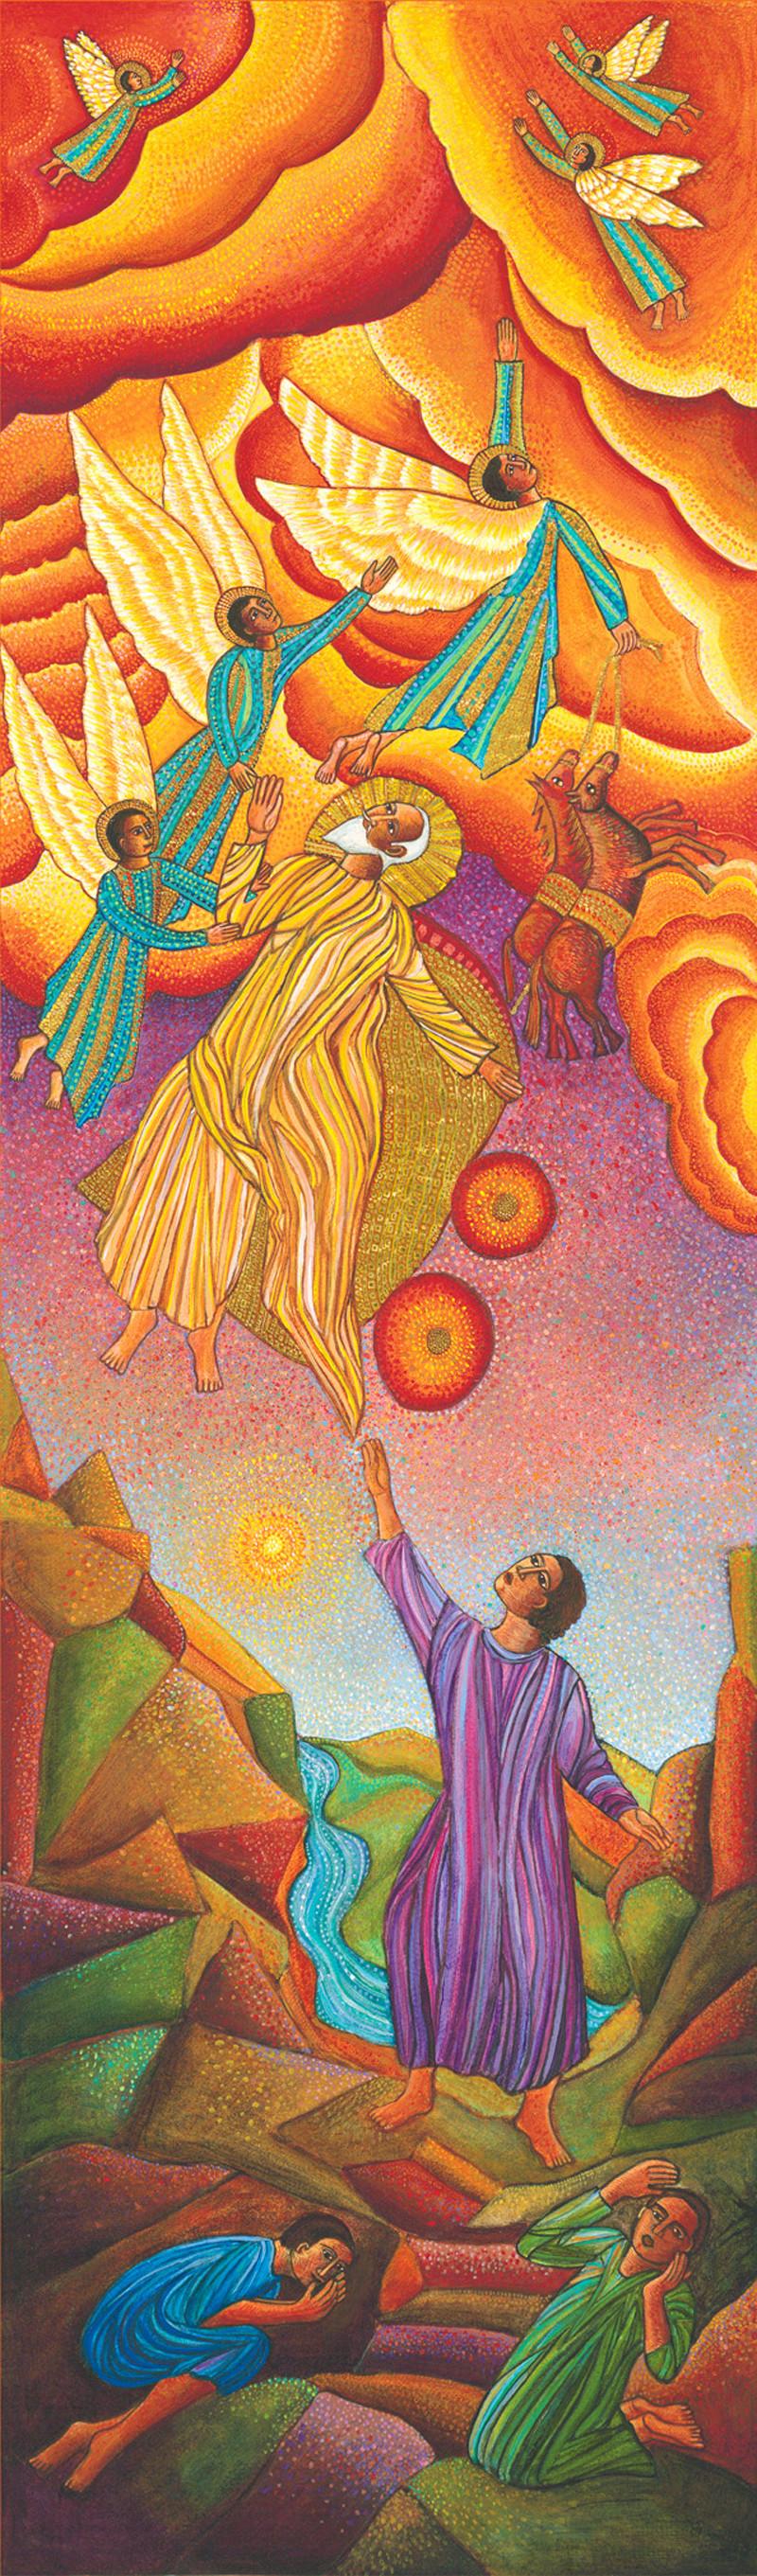 Elijah by Swanson, John August. Elijah, from Art in the Christian Tradition, a project of the Vanderbilt Divinity Library, Nashville, TN. [retrieved June 26, 2019]. Original source: www.JohnAugustSwanson.com - copyright 2008 by John August Swanson.